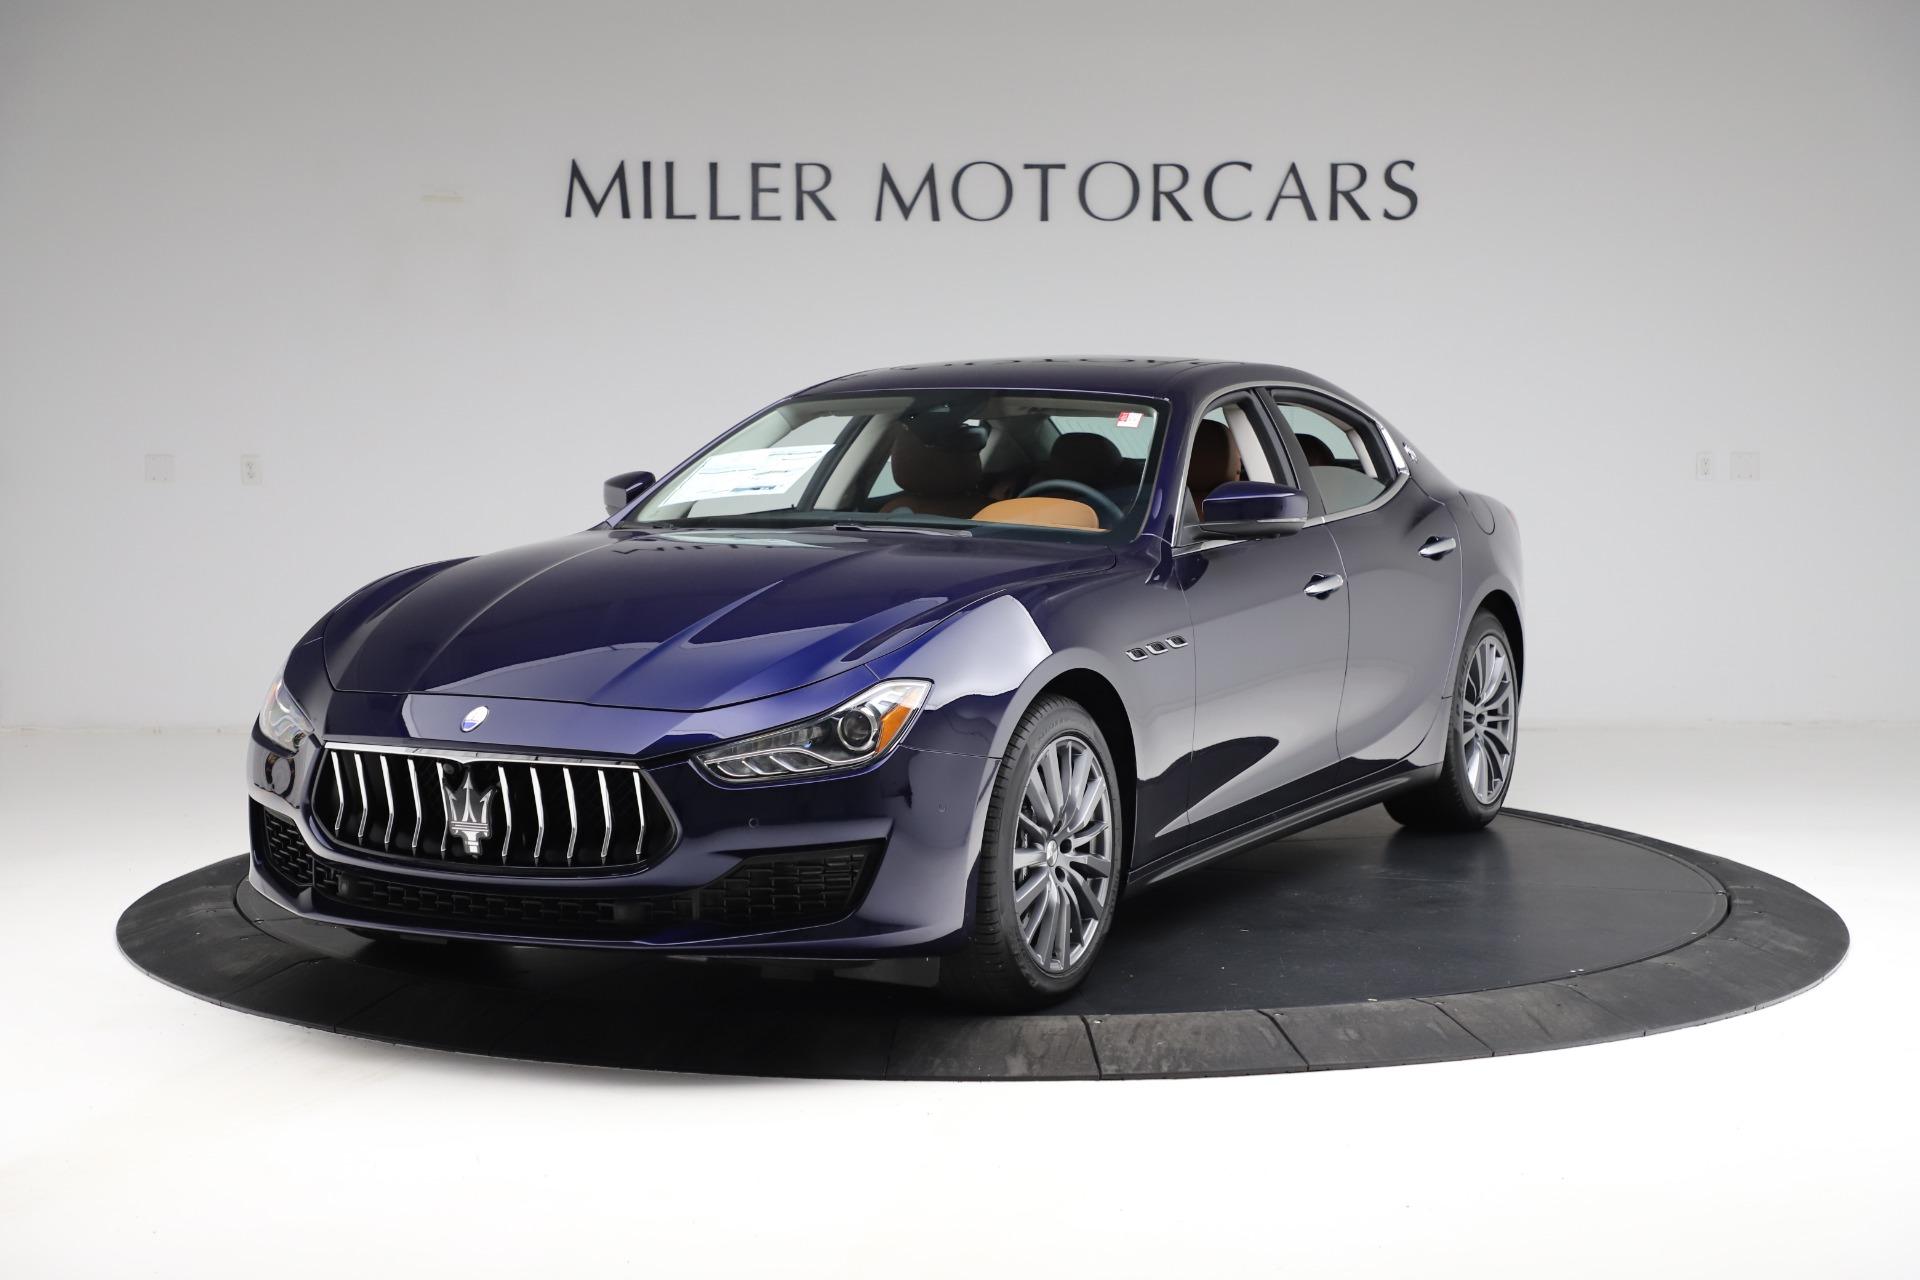 New 2021 Maserati Ghibli S Q4 for sale $86,954 at Pagani of Greenwich in Greenwich CT 06830 1